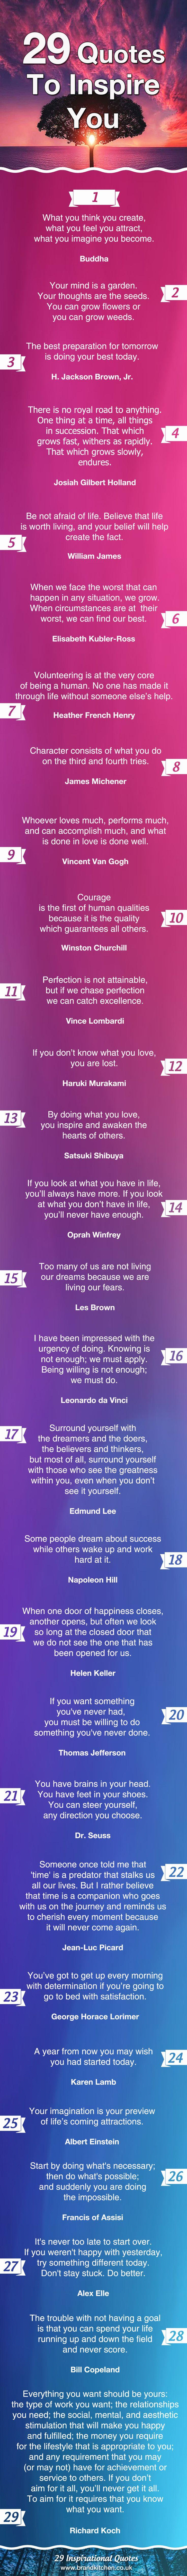 29 Quotes To Inspire You #inspirational #quotes #entrepreneur #mumpreneur